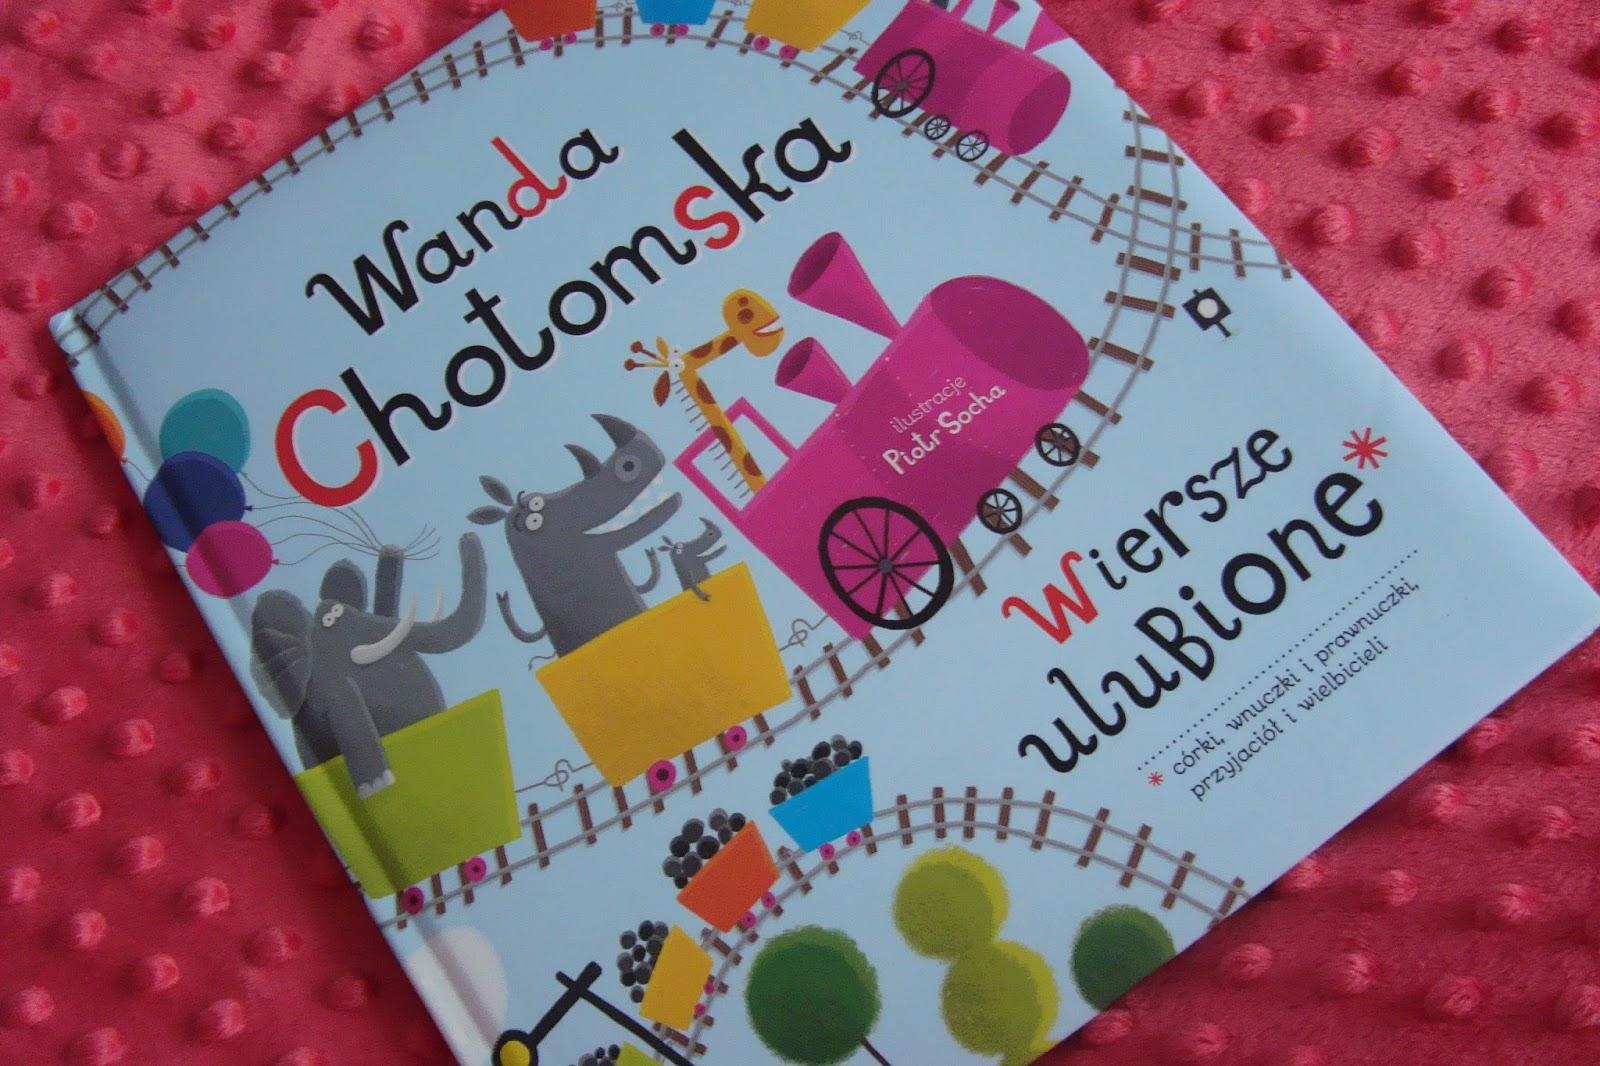 Wiersze Ulubione Wanda Chotomska Wydawnictwo Muza